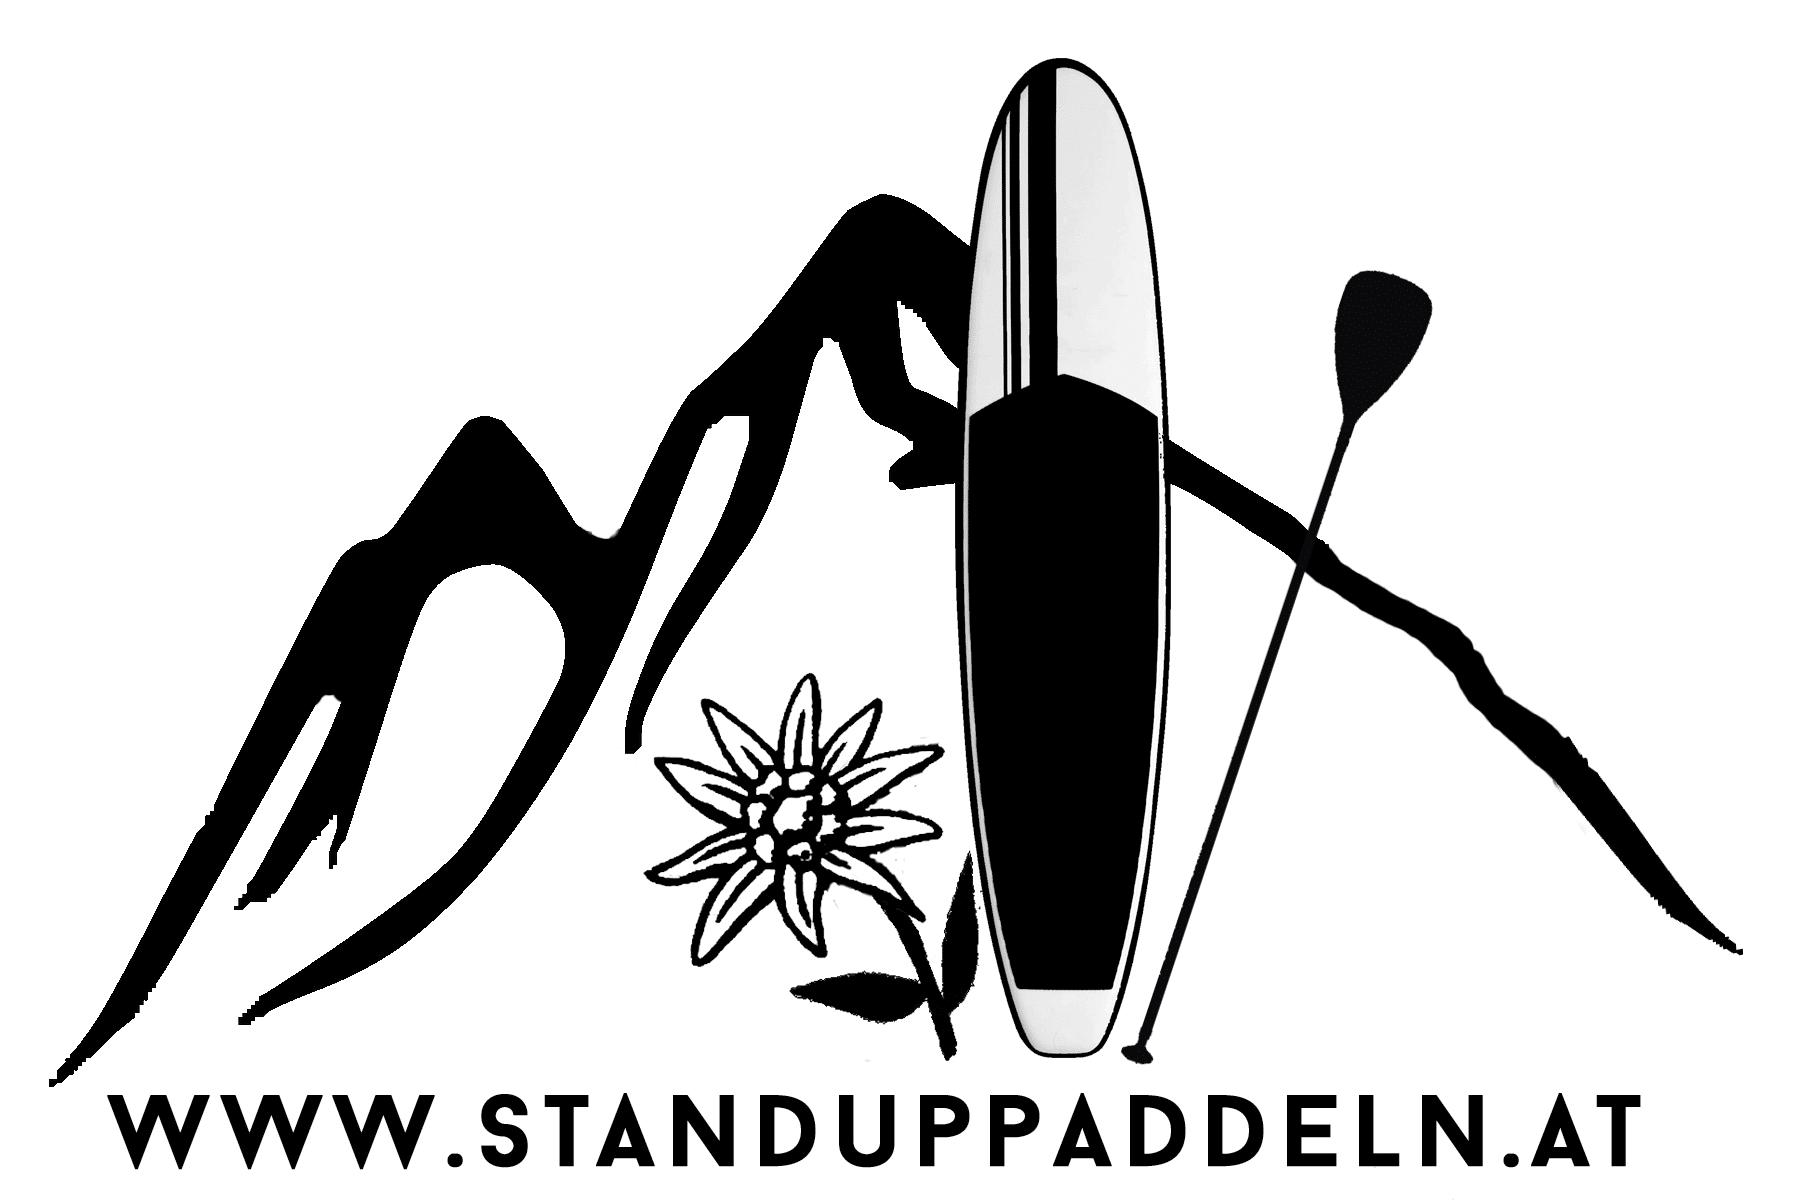 STANDUPPADDELN